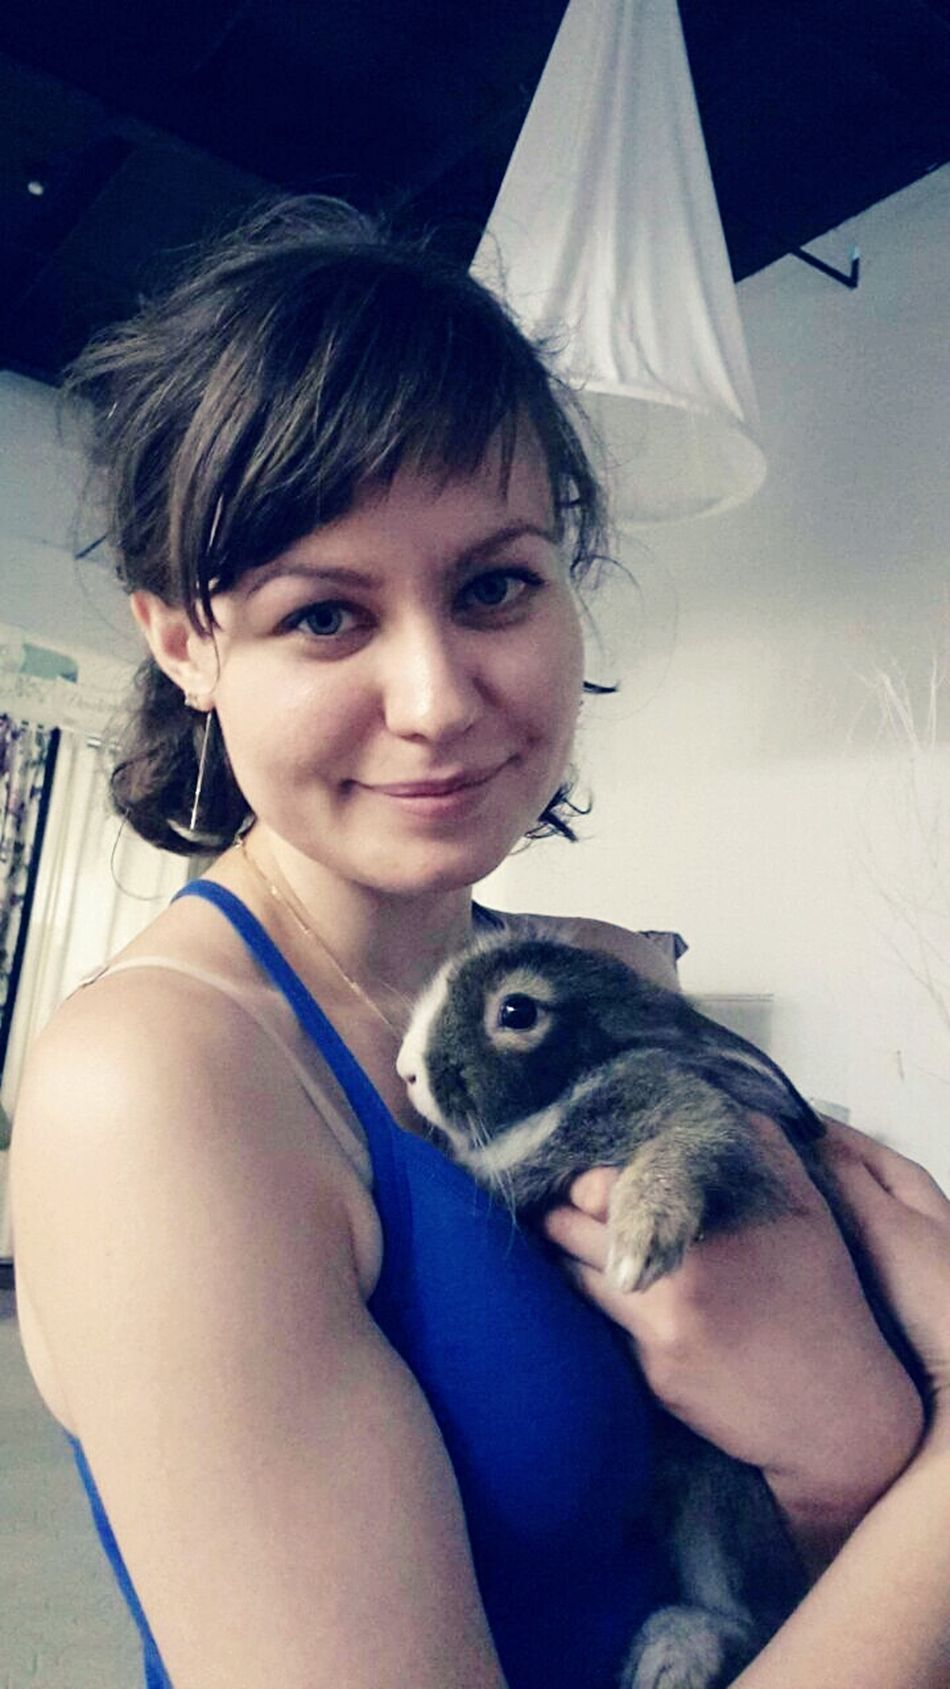 Myjob Rabbit ❤️ Sosweetly Funny Faces WeAreSoHappy That's Me Russian Girl Newjob Thaimassage Woman's Club